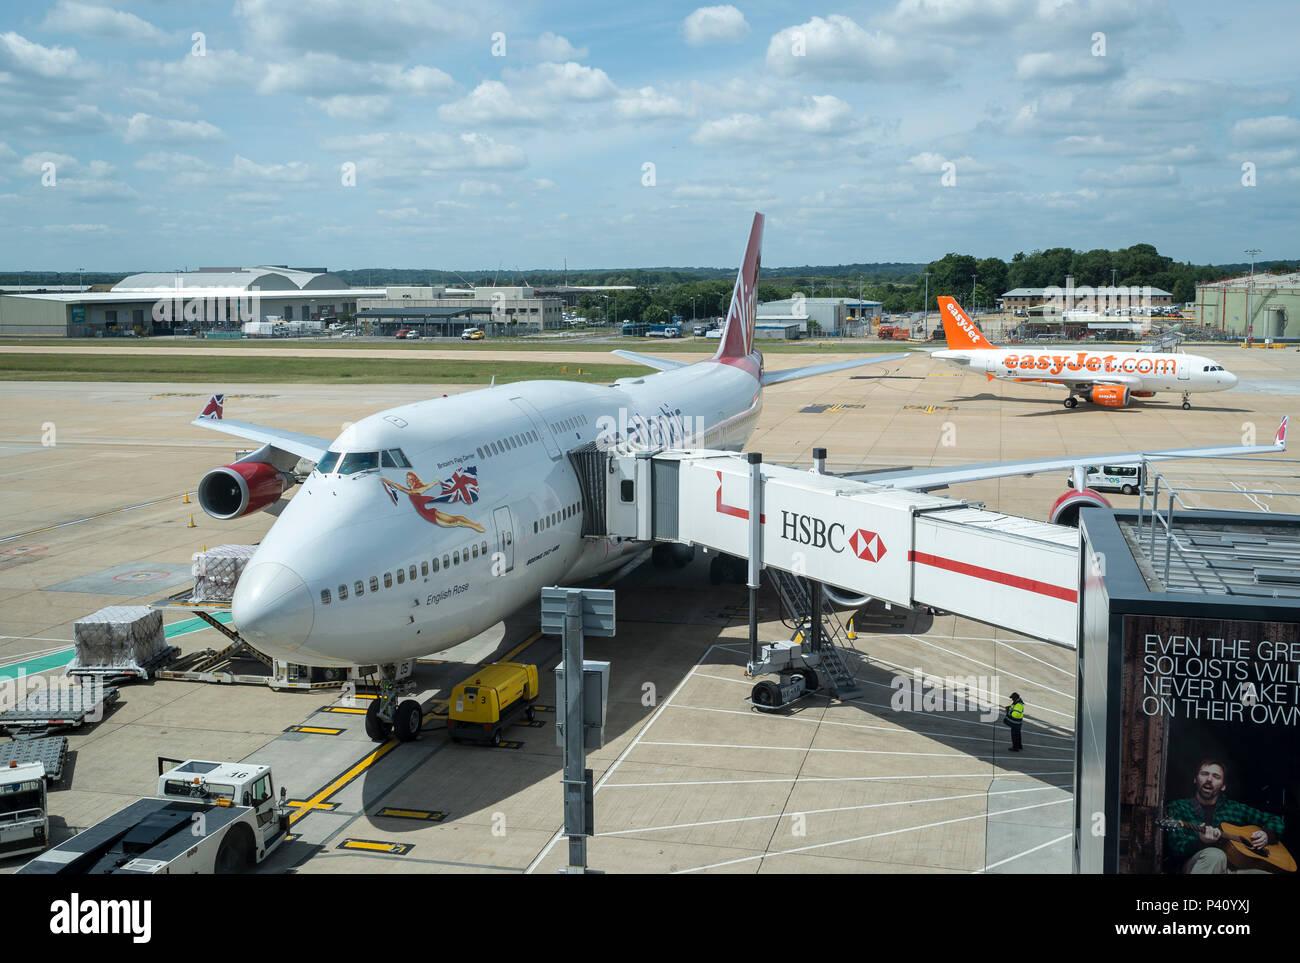 A Virgin Atlantic Boeing 747-400 aircraft being prepared on